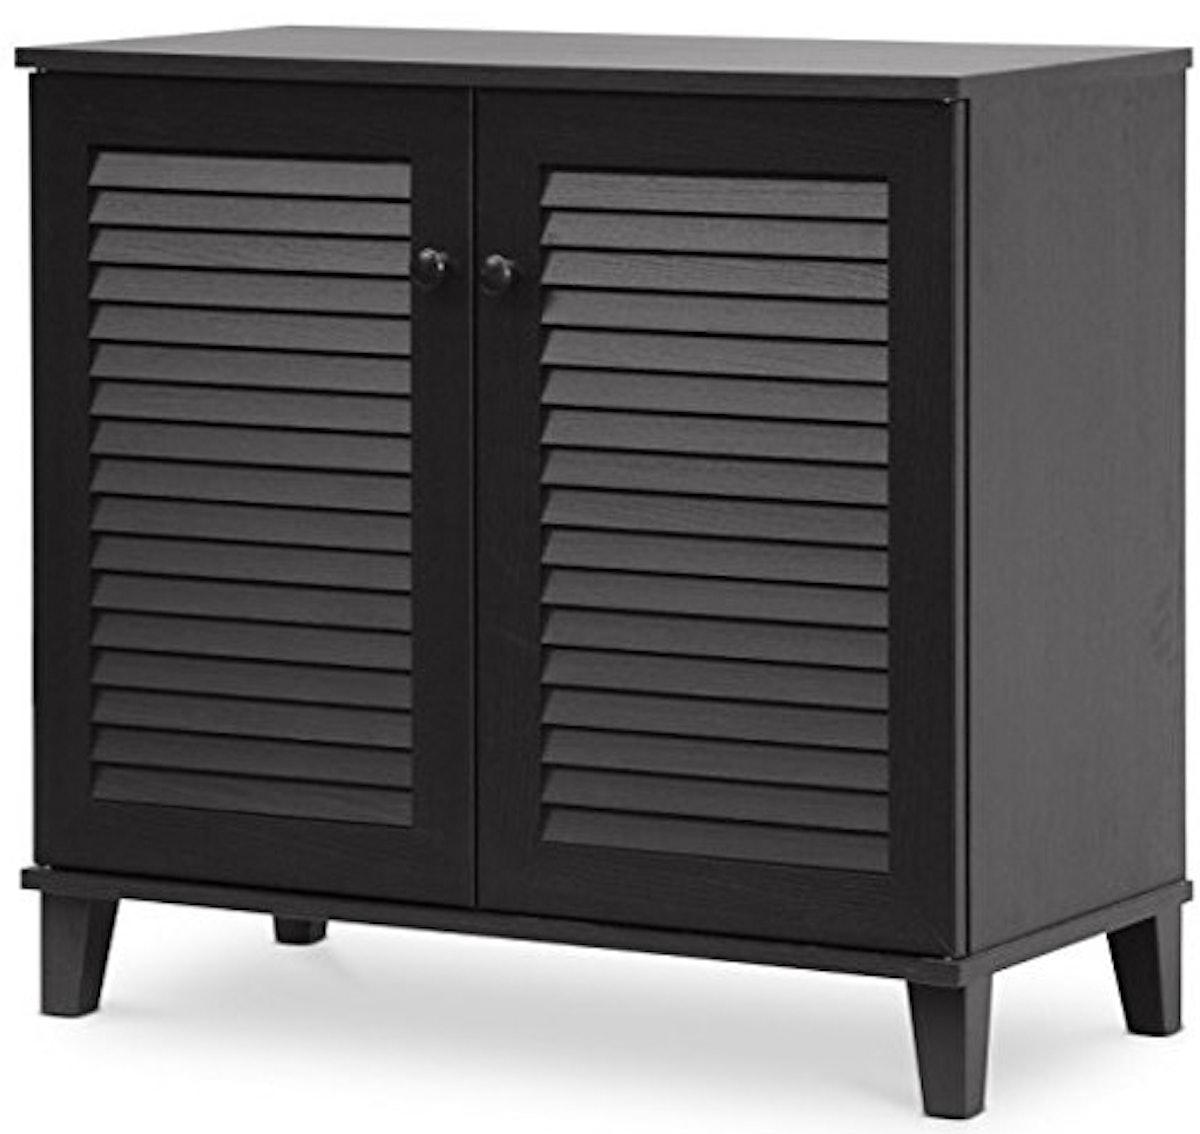 Baxton Studio Coolidge Shoe-Storage Cabinet